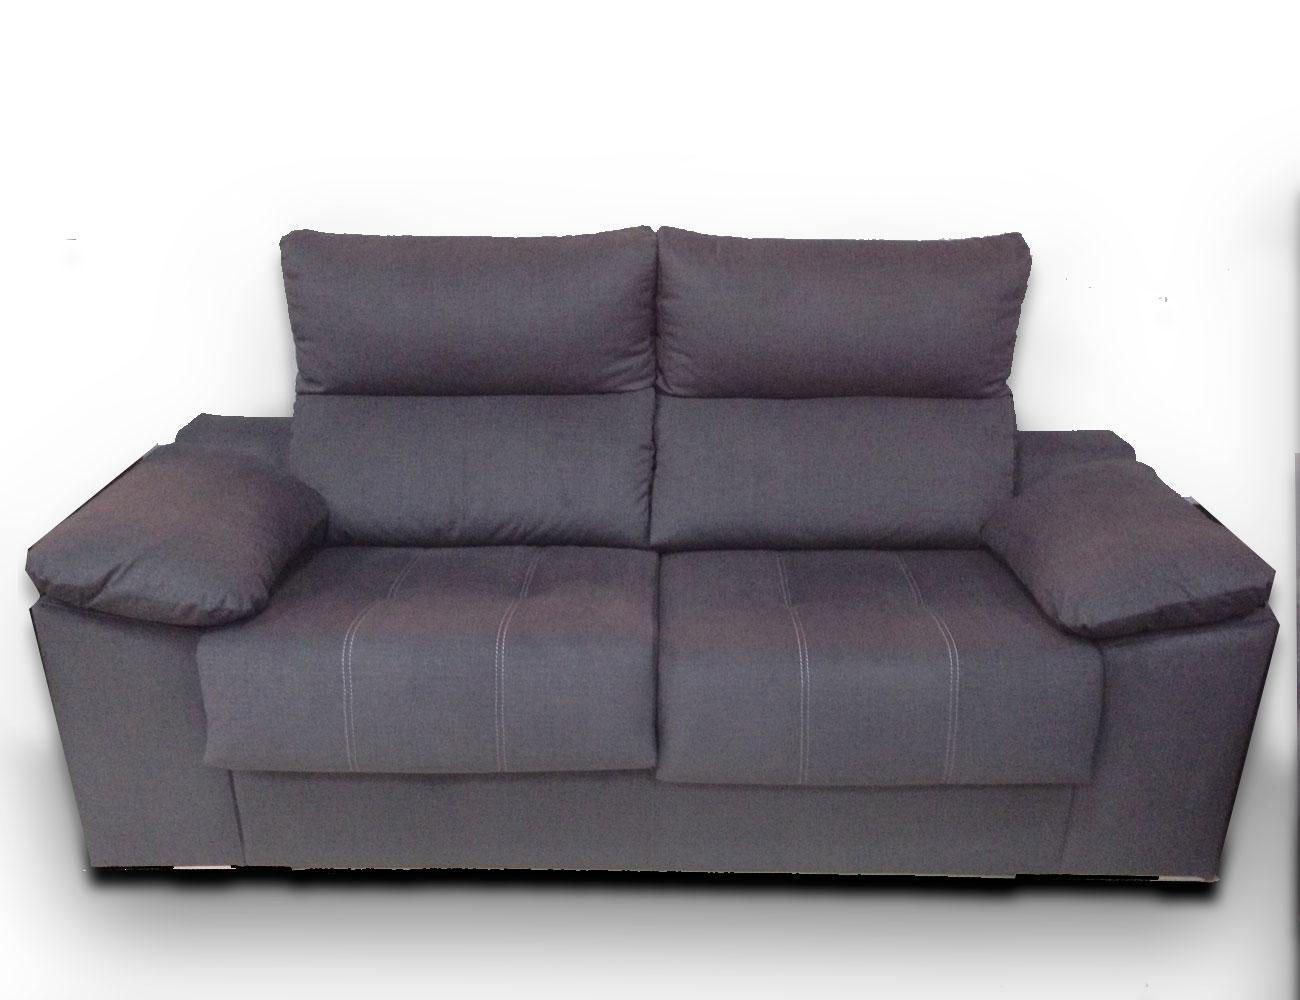 Sofa 3 plazas8